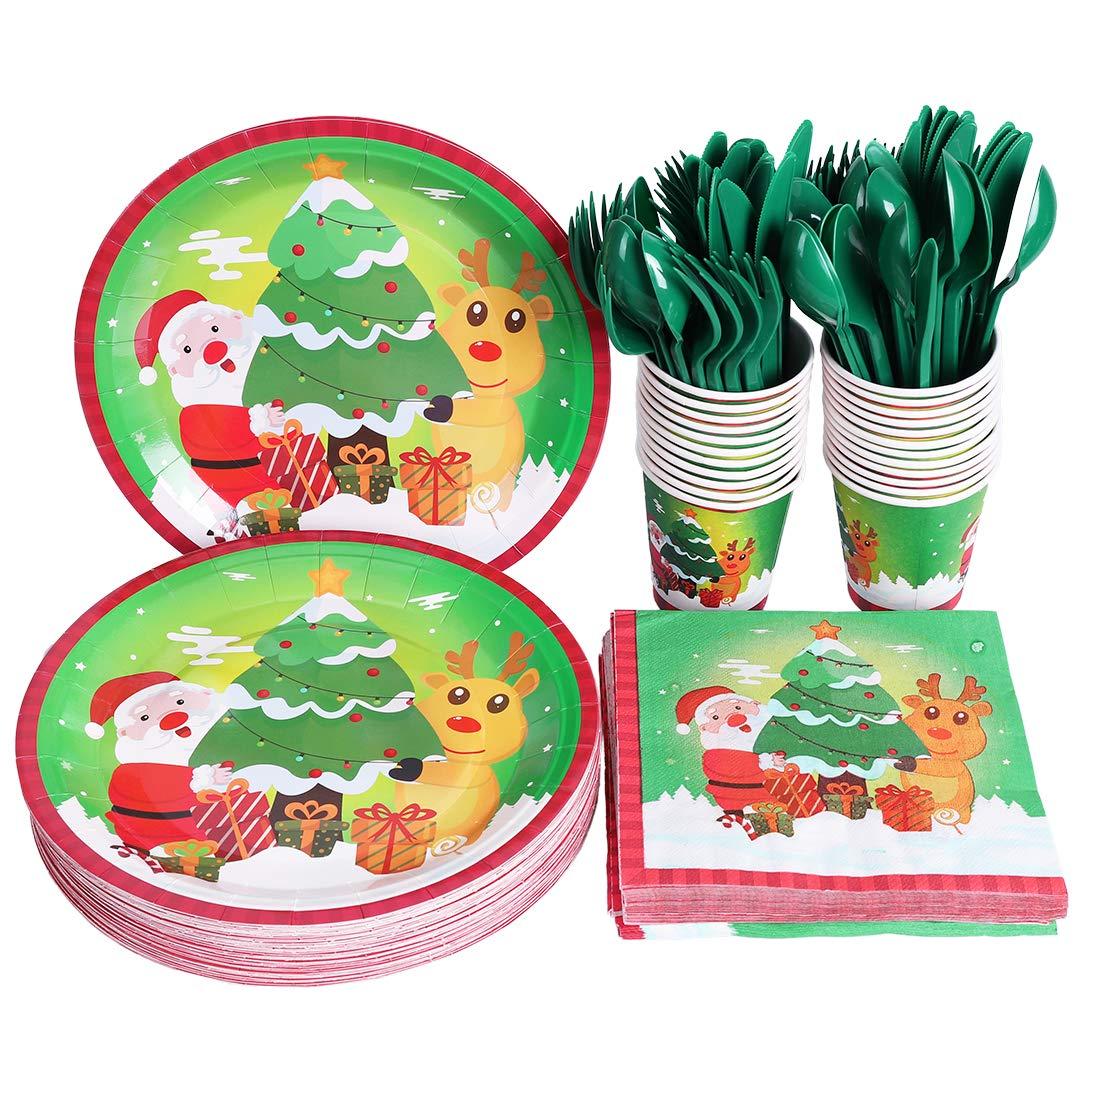 Christmas Party Supplies Set Xmas Party Pack Santa elk Disposable Paper Plates Napkins Tableware Set Dinnerware Serves 50 Guests for Kids